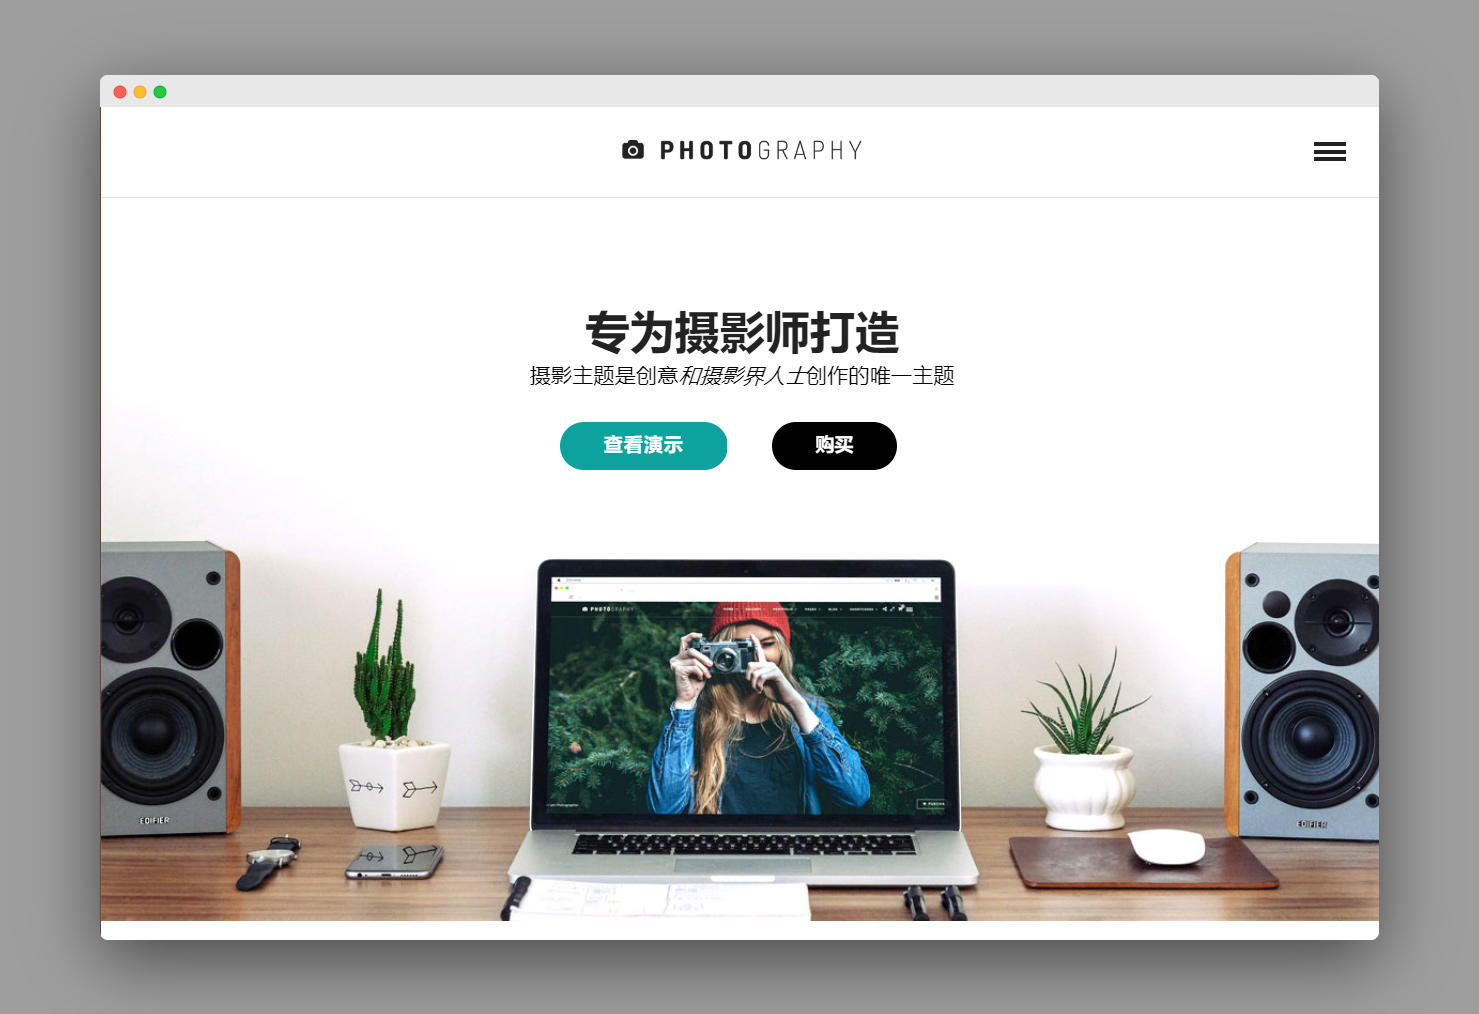 WordPress Photography v6.4.1主题 响应式网站拍摄相册图片模版